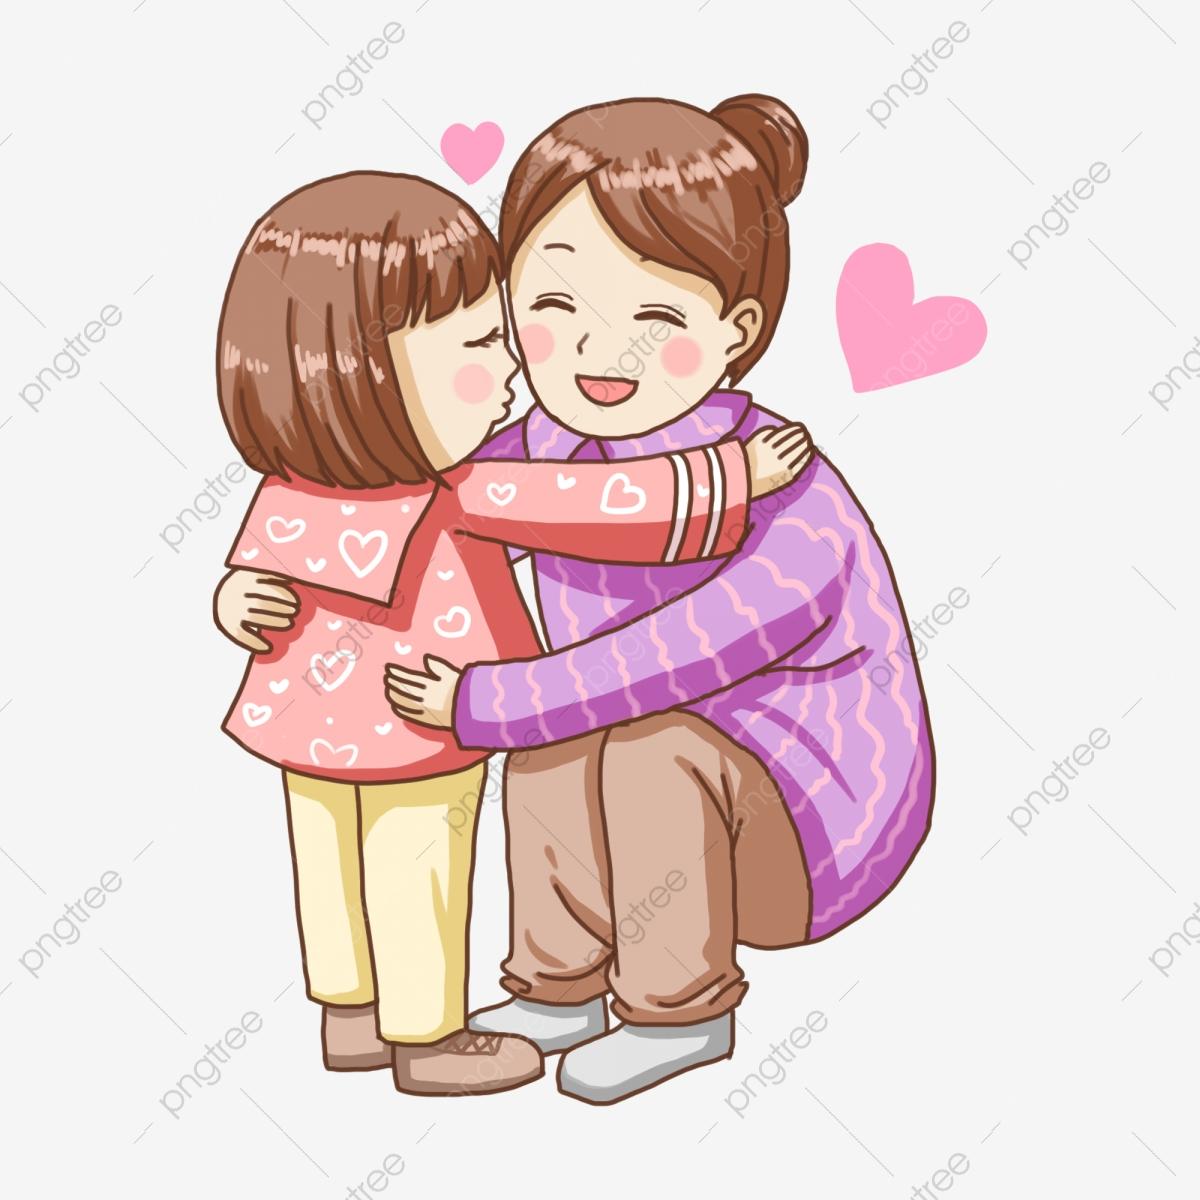 Kiss clipart kiss on cheek. Cartoon hand painted embrace